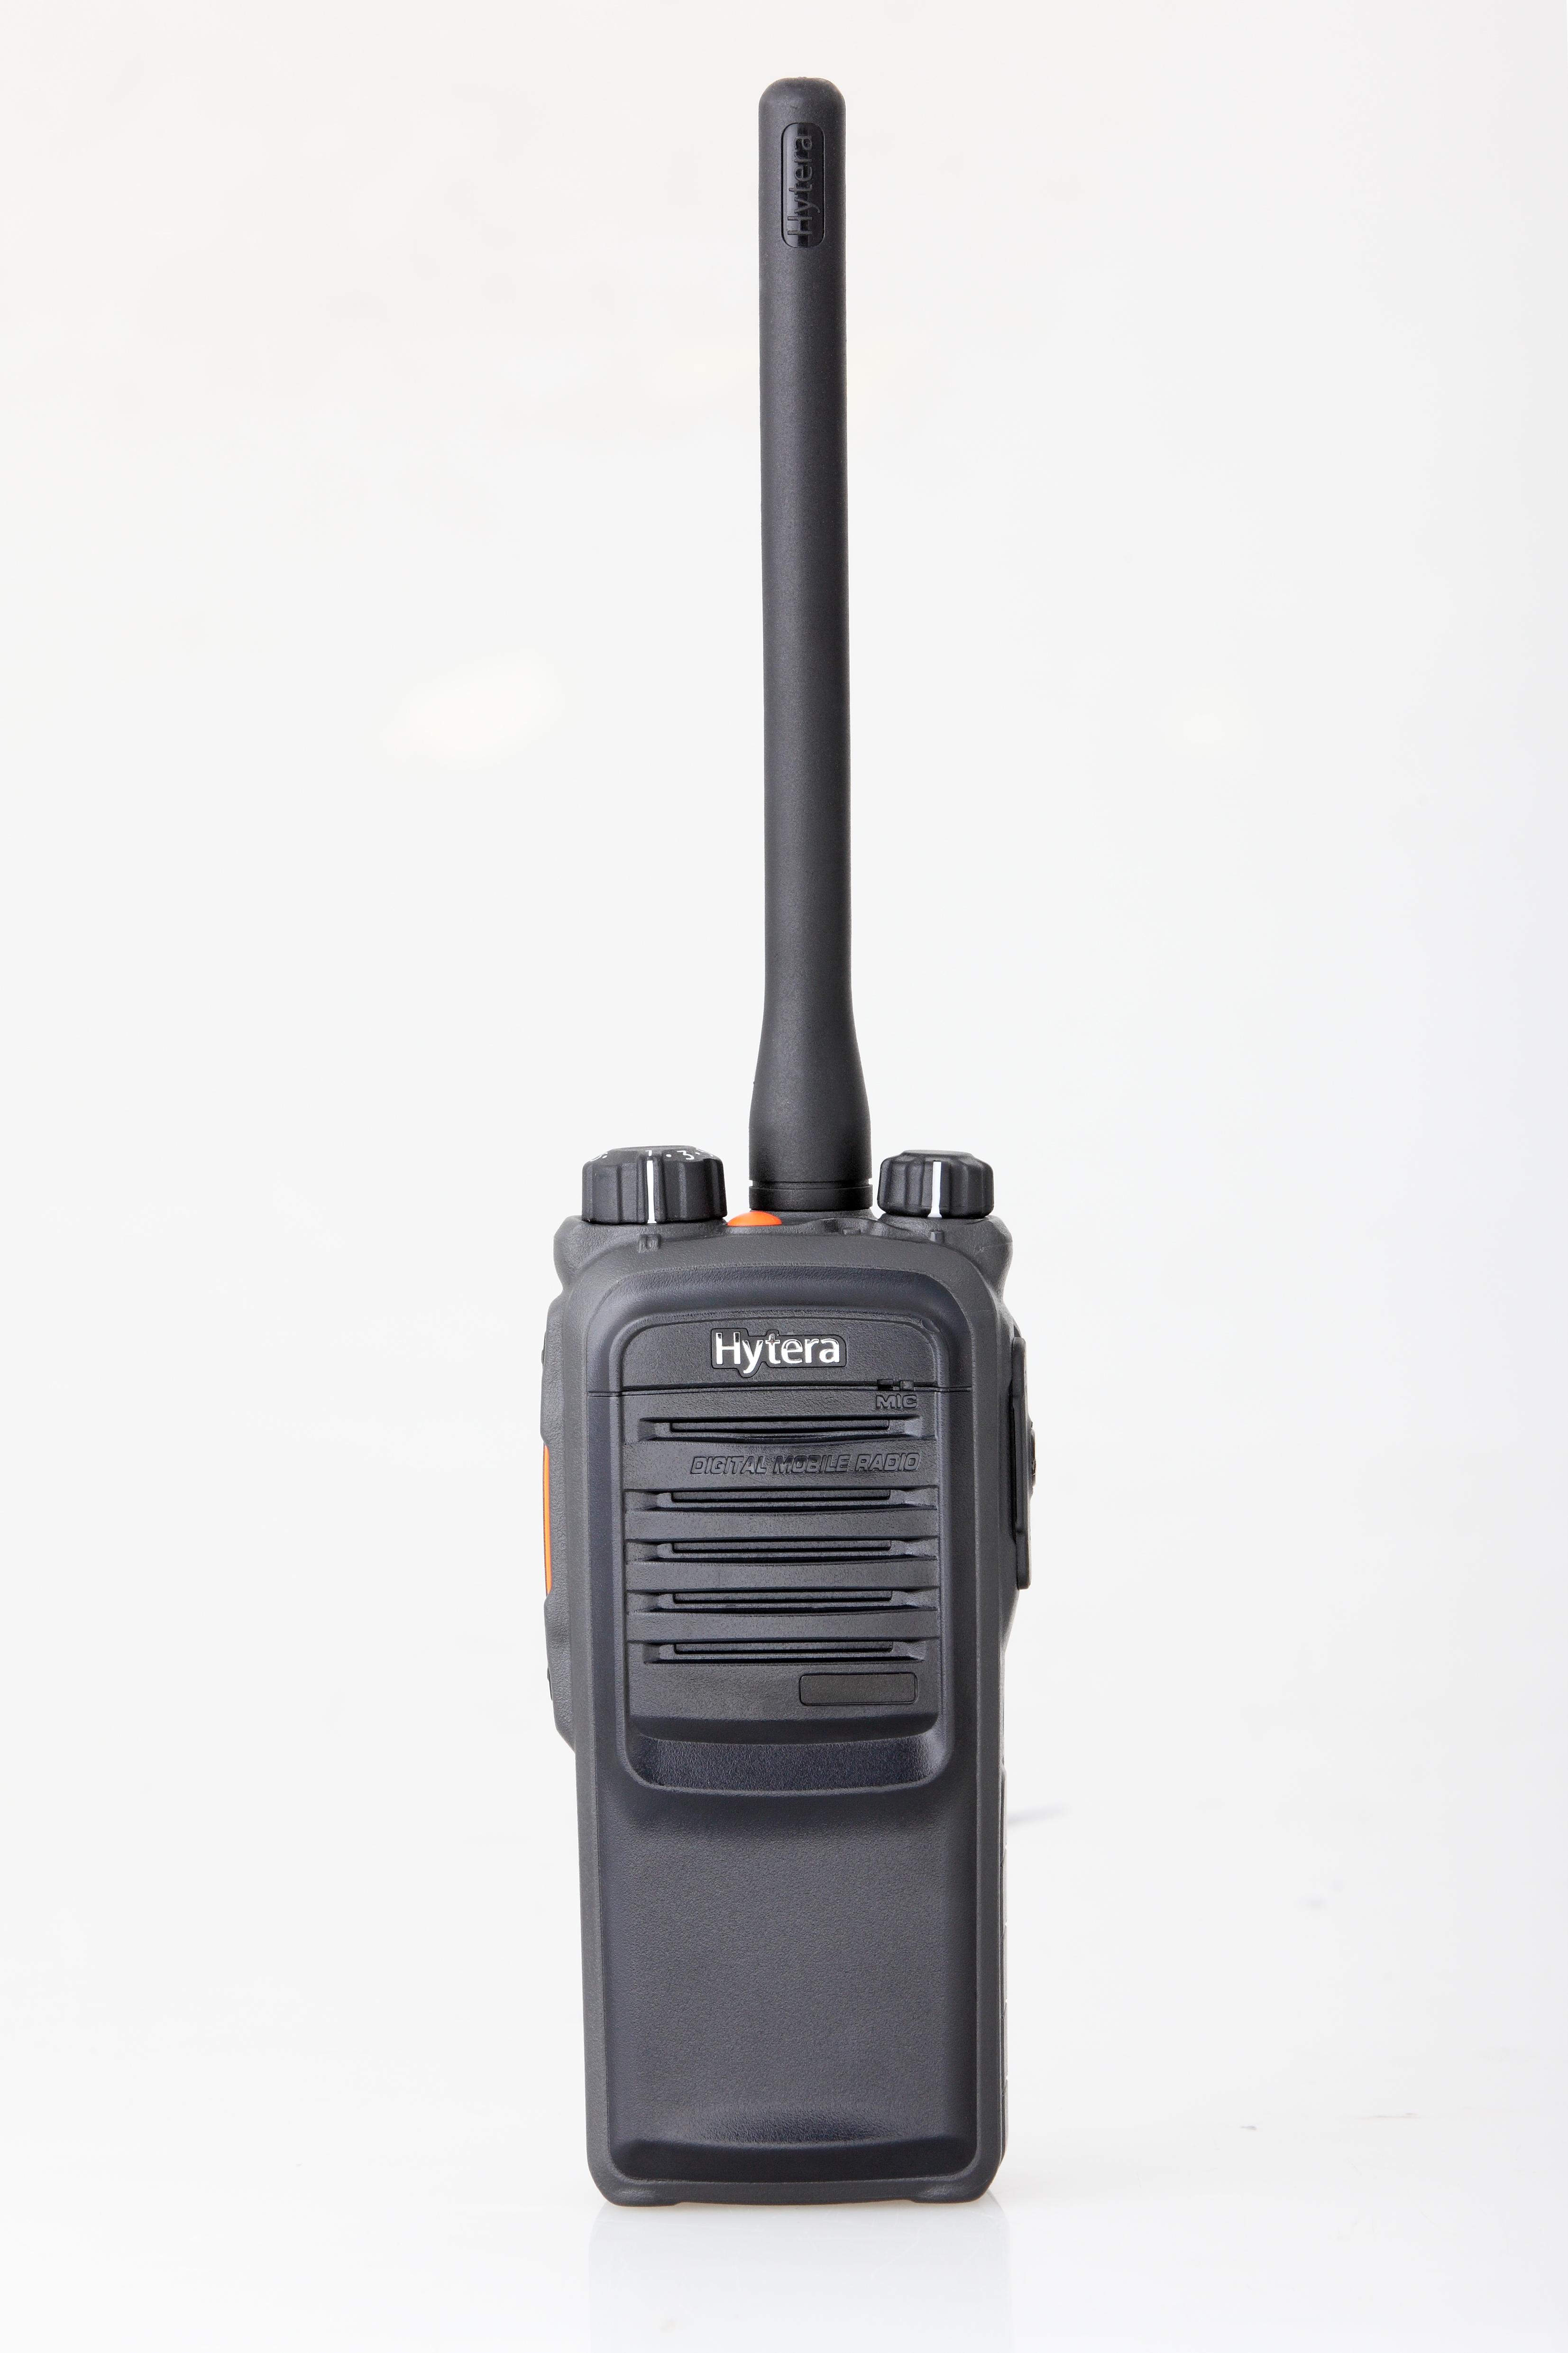 Hytera PD705-705G digital two way radio